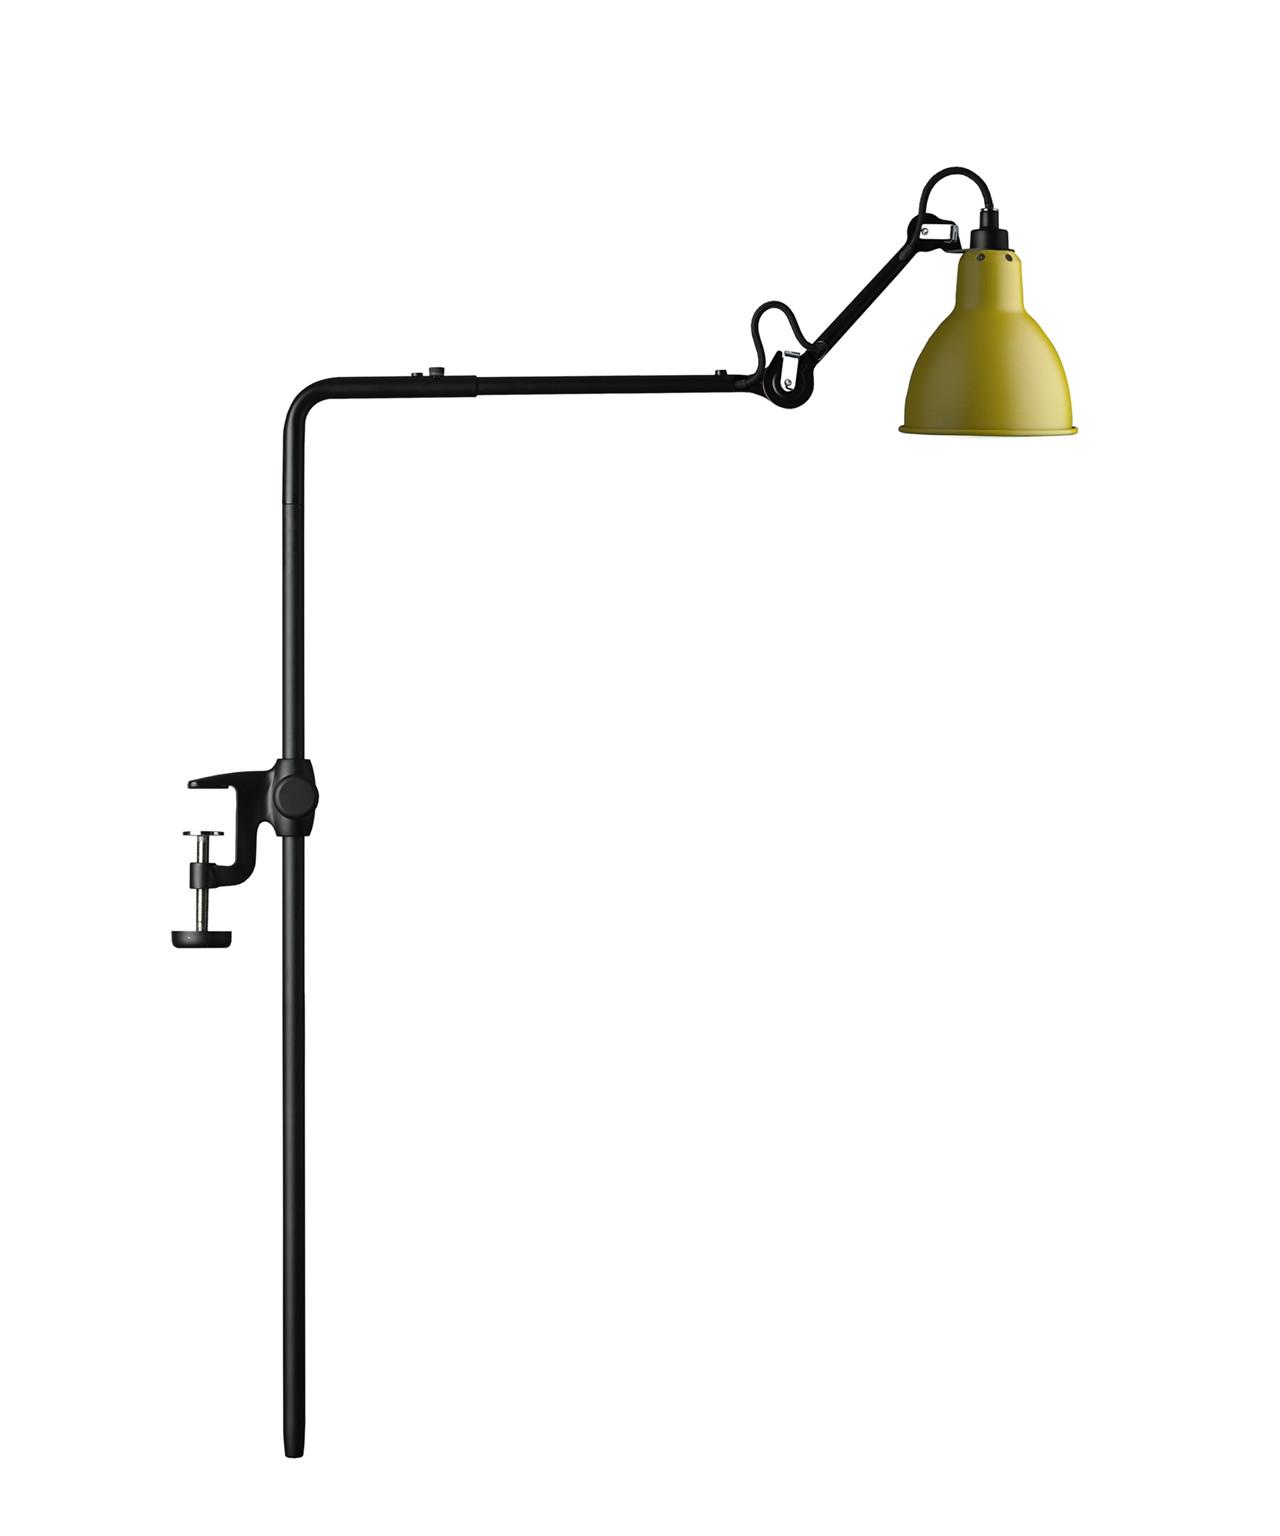 226 bordlampe reol lampe gul lampe gras. Black Bedroom Furniture Sets. Home Design Ideas